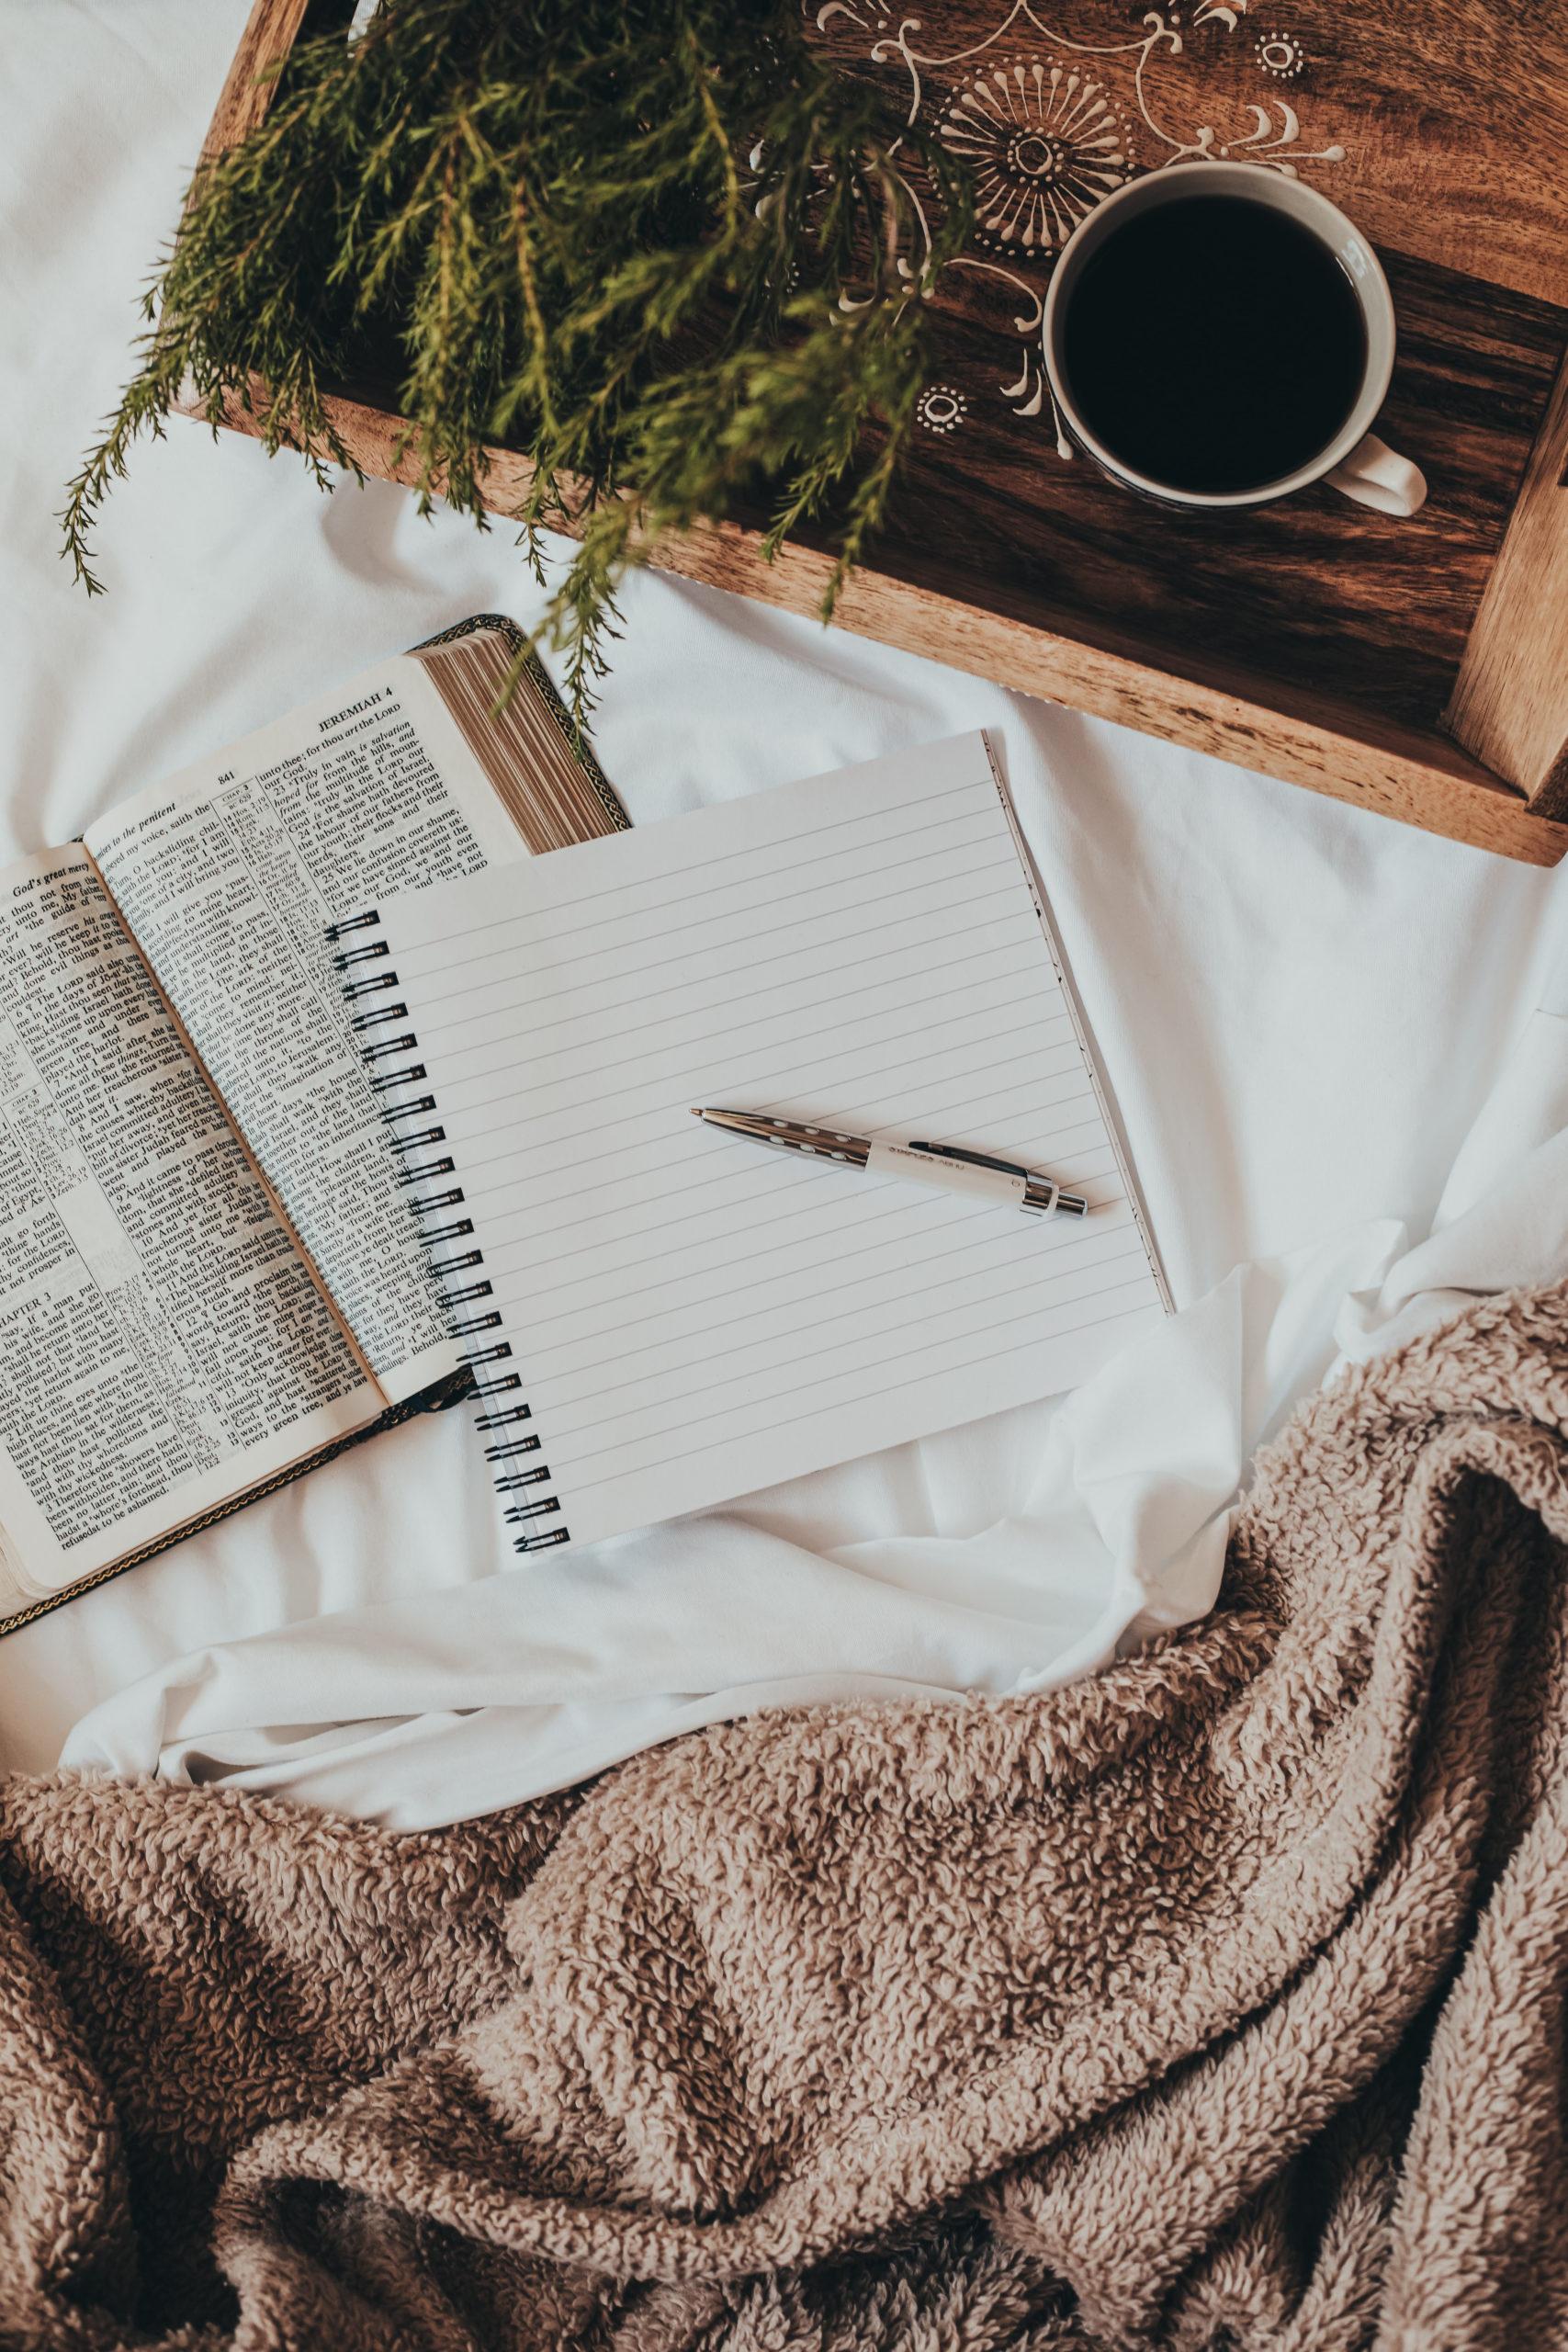 bible, journaling, coffe